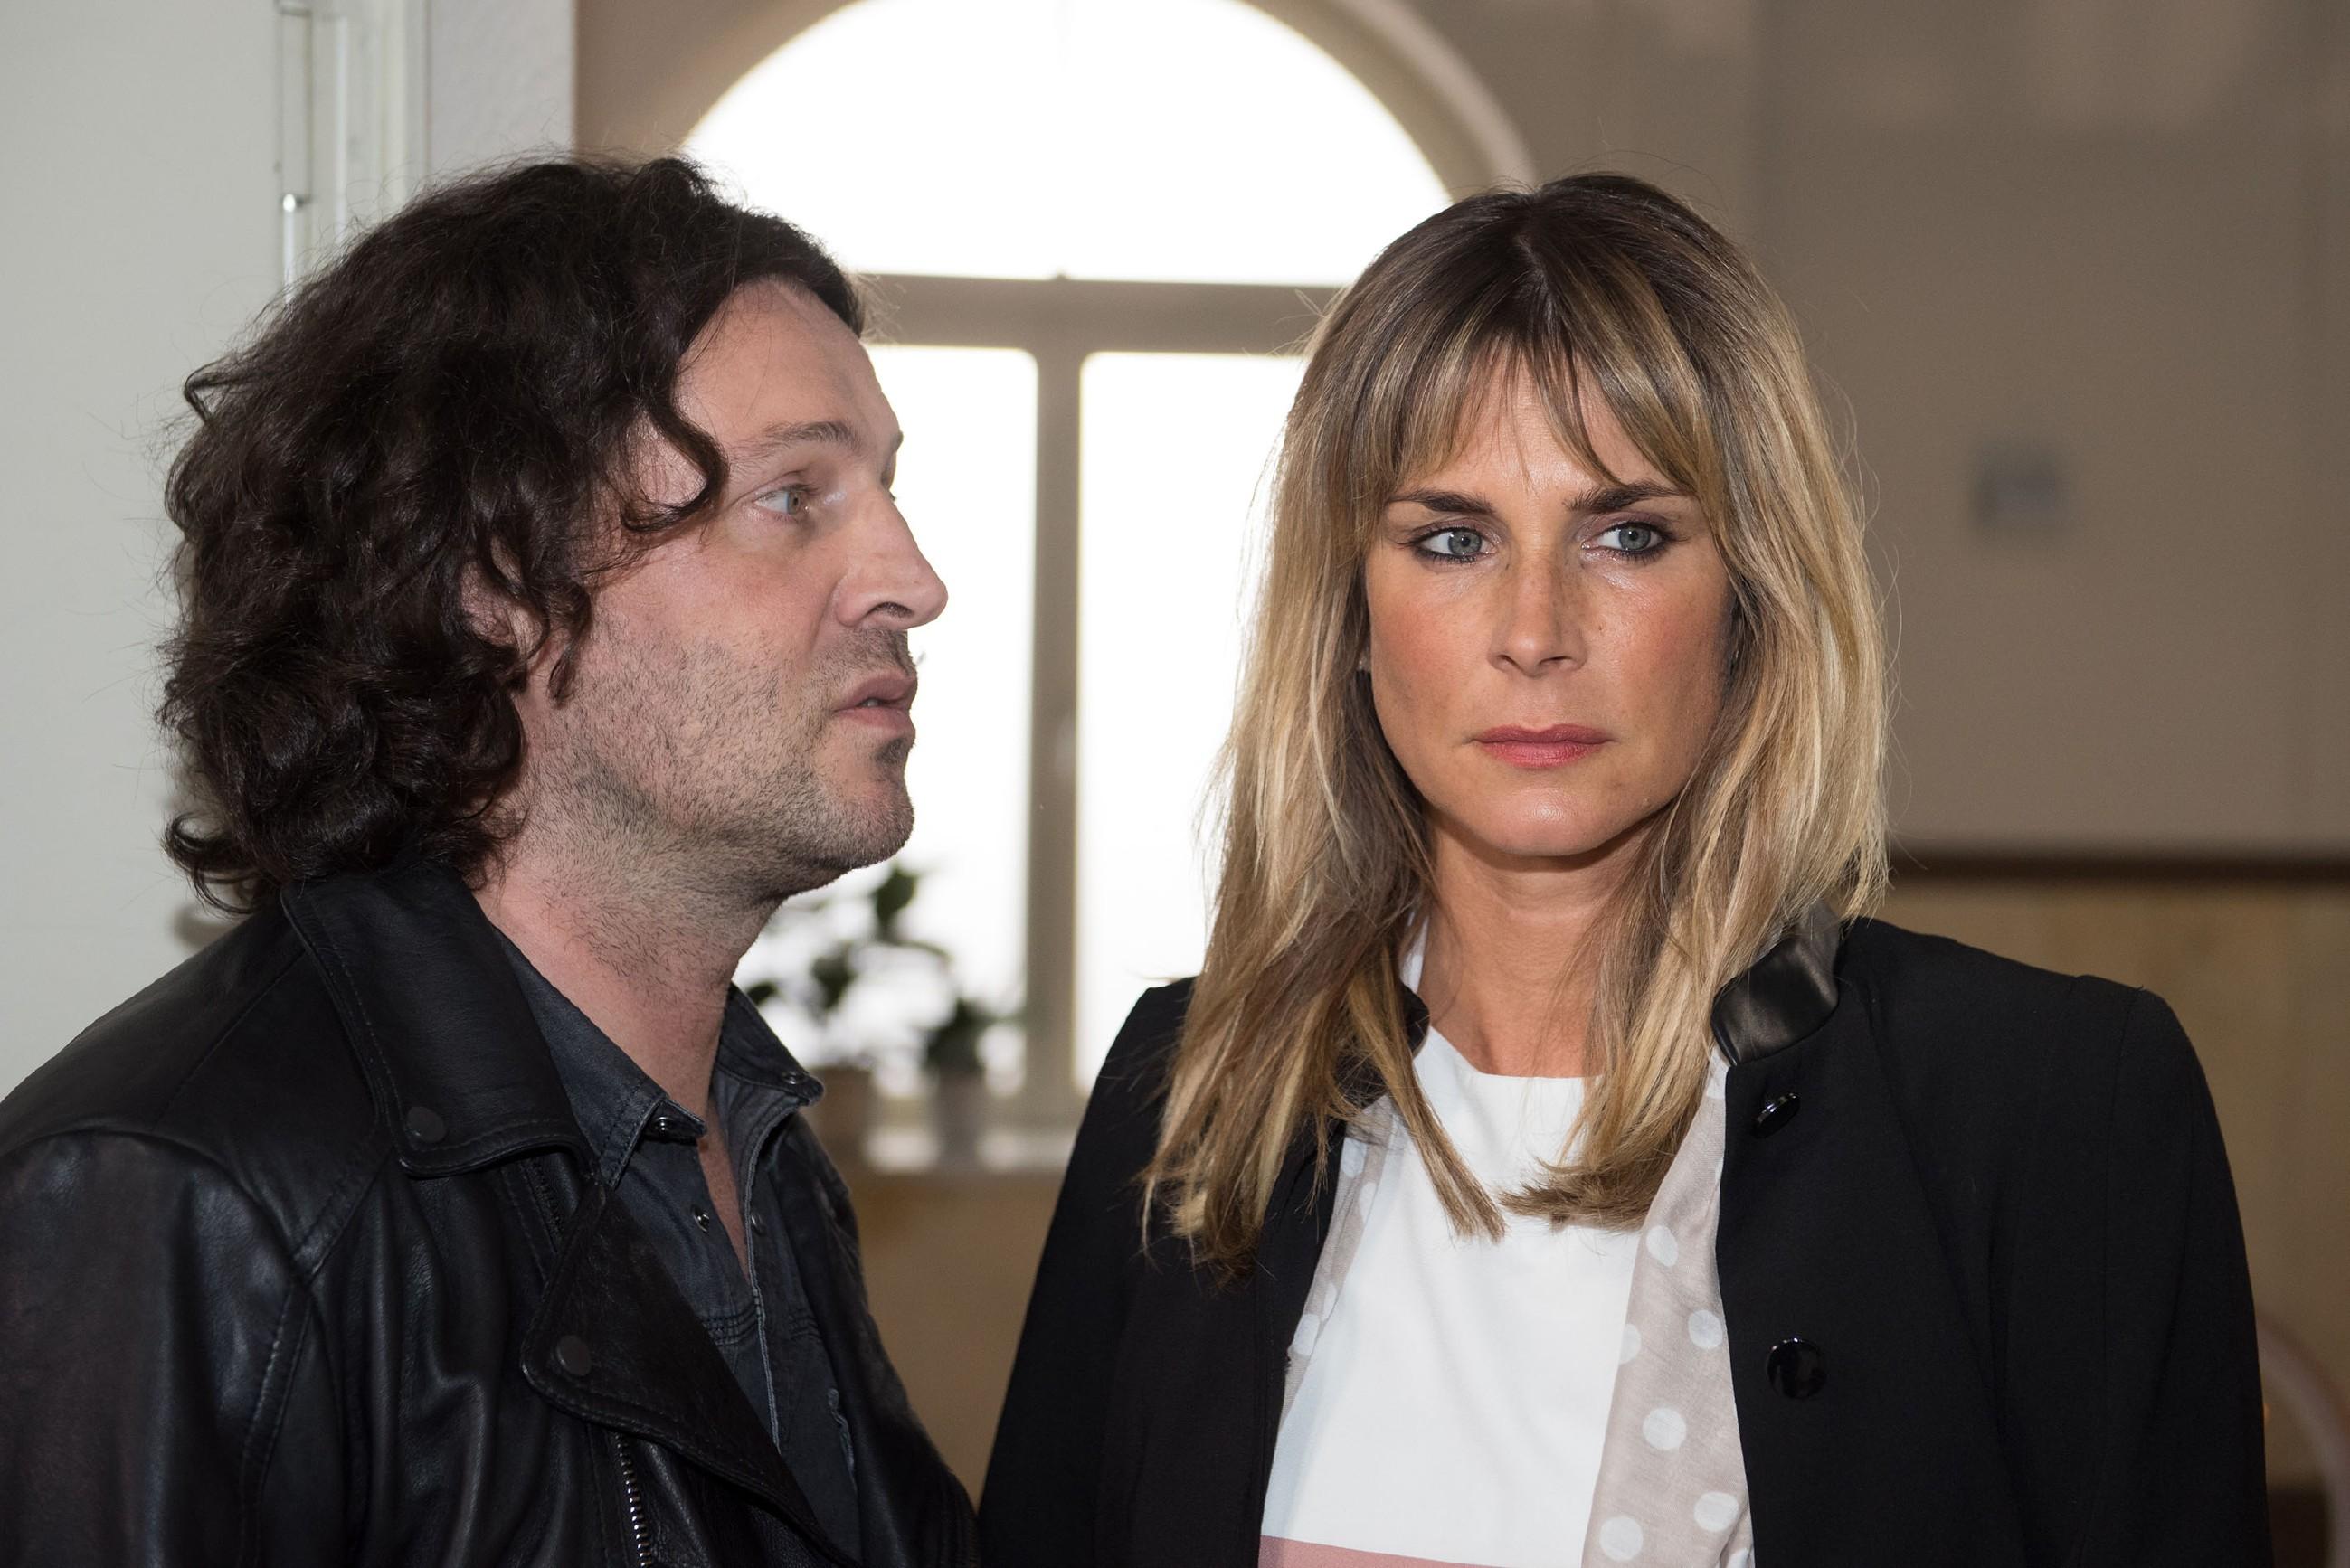 Eva (Claudelle Deckert) ist bemüht, Rolfs (Stefan Franz) Drohung an sich abprallen zu lassen. (Quelle: RTL / Stefan Behrens)